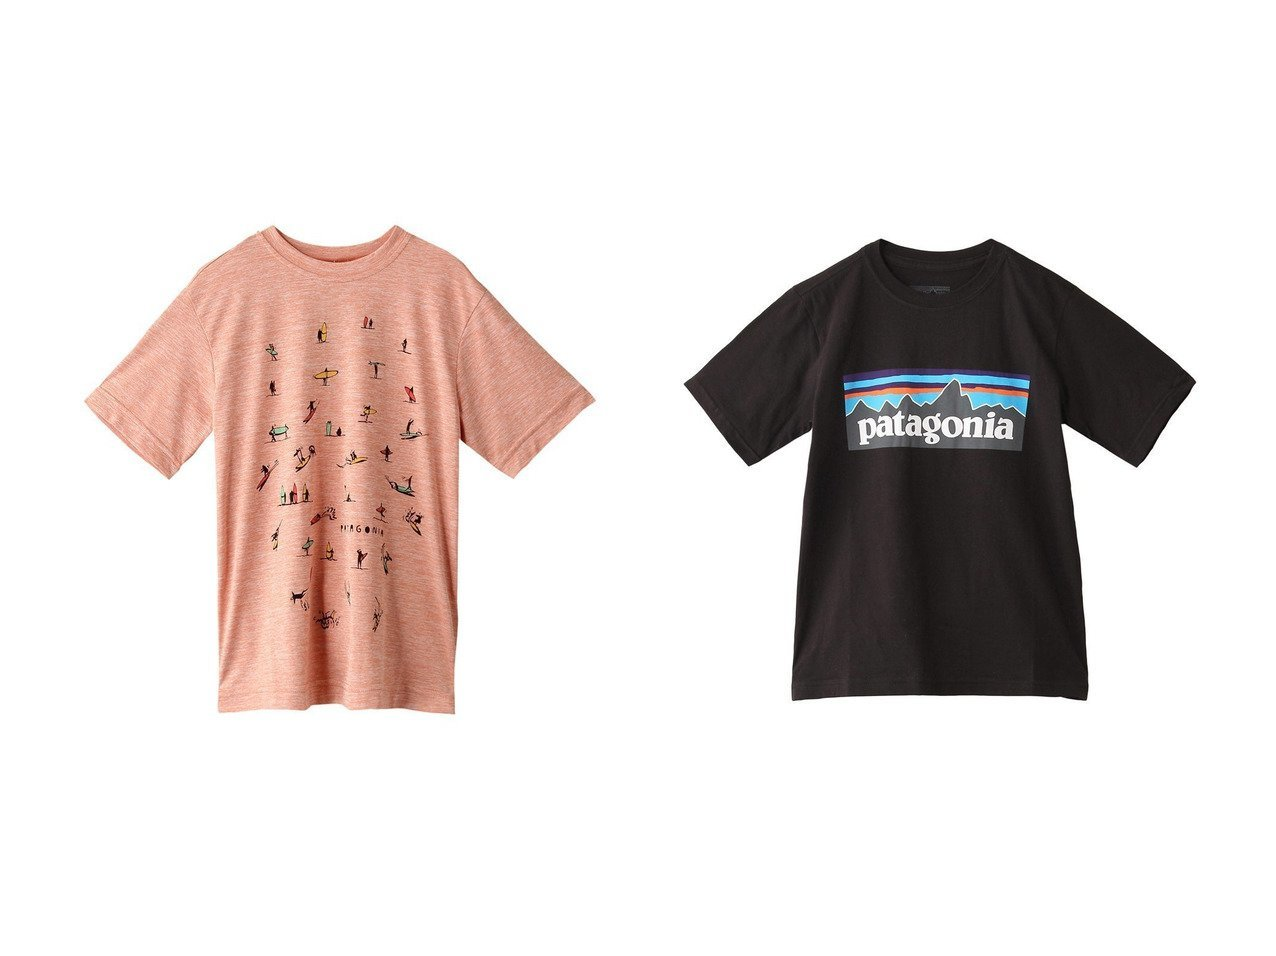 【patagonia / KIDS/パタゴニア】の【KIDS】Boys キャップクールデイリーTシャツ&【KIDS】Boys P-6 ロゴオーガニックTシャツ 【KIDS】子供服のおすすめ!人気トレンド・キッズファッションの通販  おすすめで人気の流行・トレンド、ファッションの通販商品 メンズファッション・キッズファッション・インテリア・家具・レディースファッション・服の通販 founy(ファニー) https://founy.com/ ファッション Fashion キッズファッション KIDS トップス カットソー Tops Tees Kids 2021年 2021 2021 春夏 S/S SS Spring/Summer 2021 S/S 春夏 SS Spring/Summer フィット 春 Spring |ID:crp329100000025389